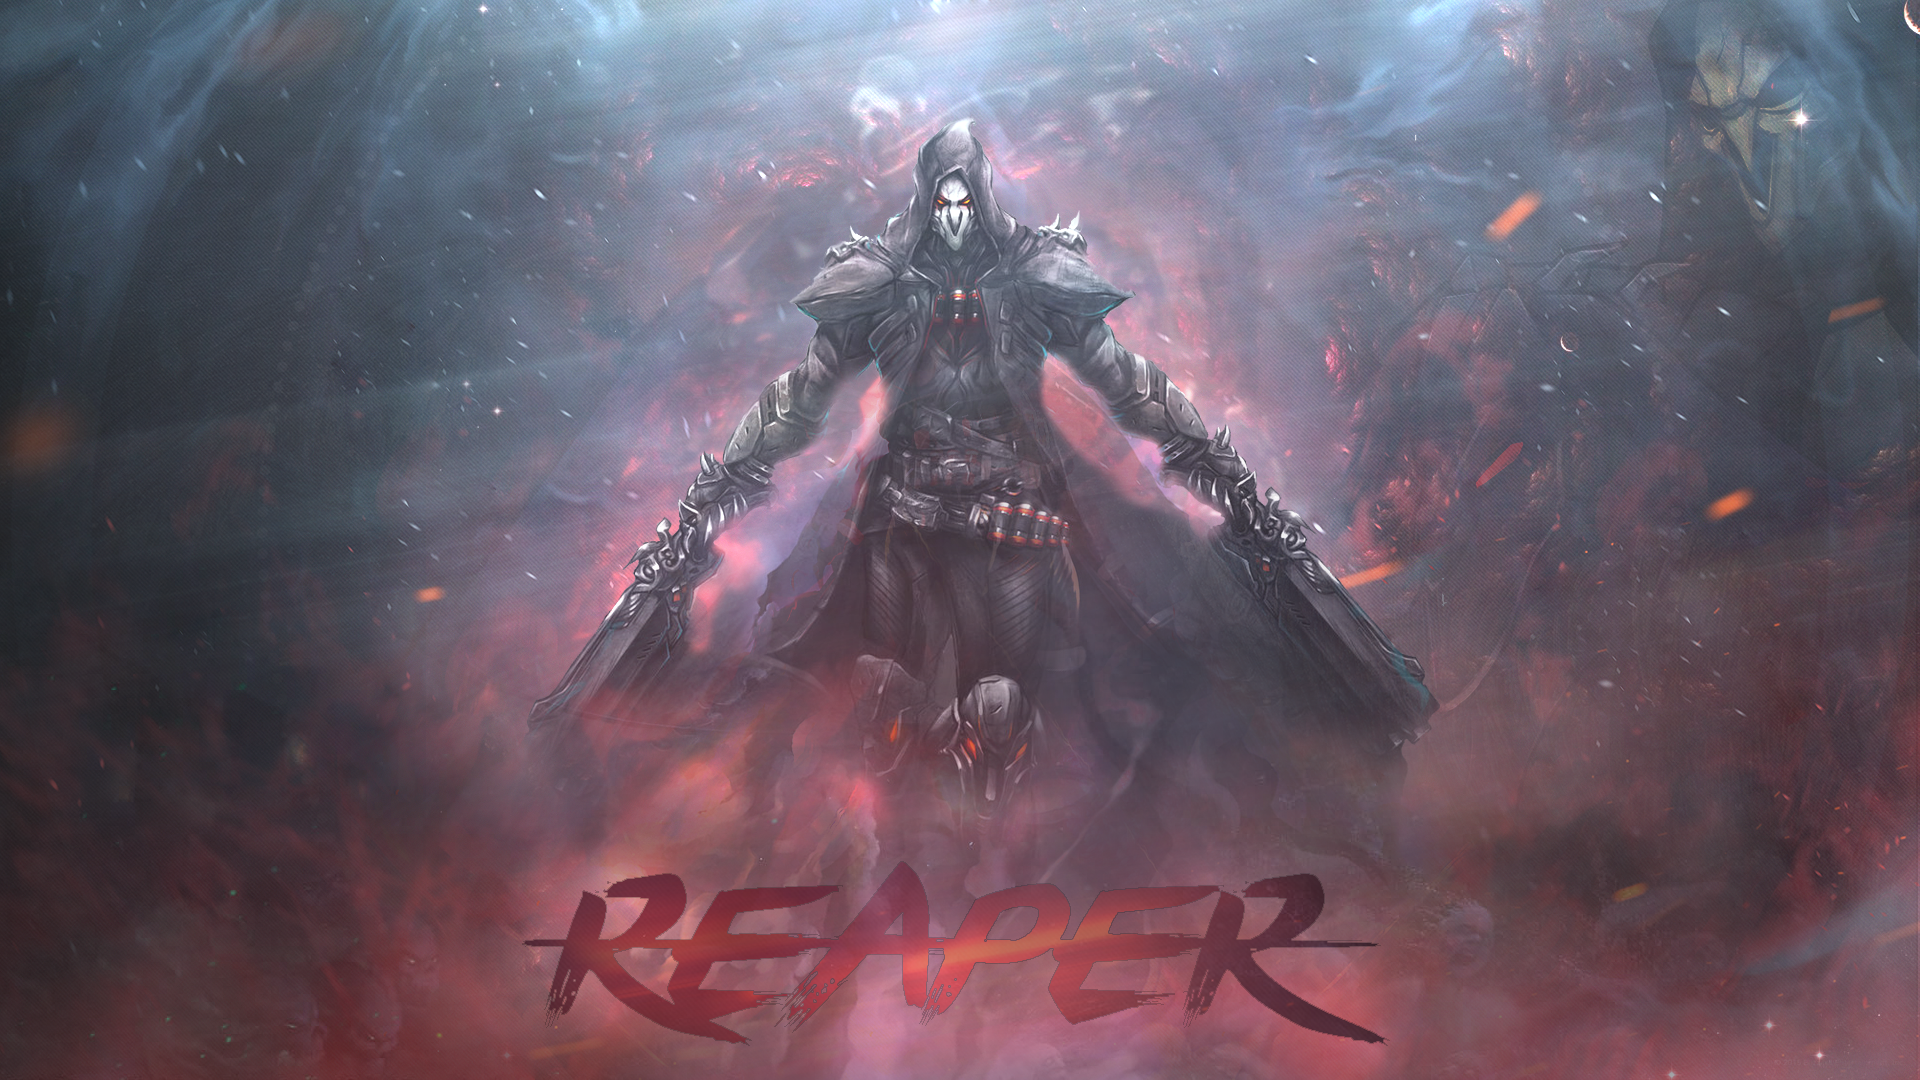 Jeux Video Overwatch Reaper Overwatch Fond D Ecran